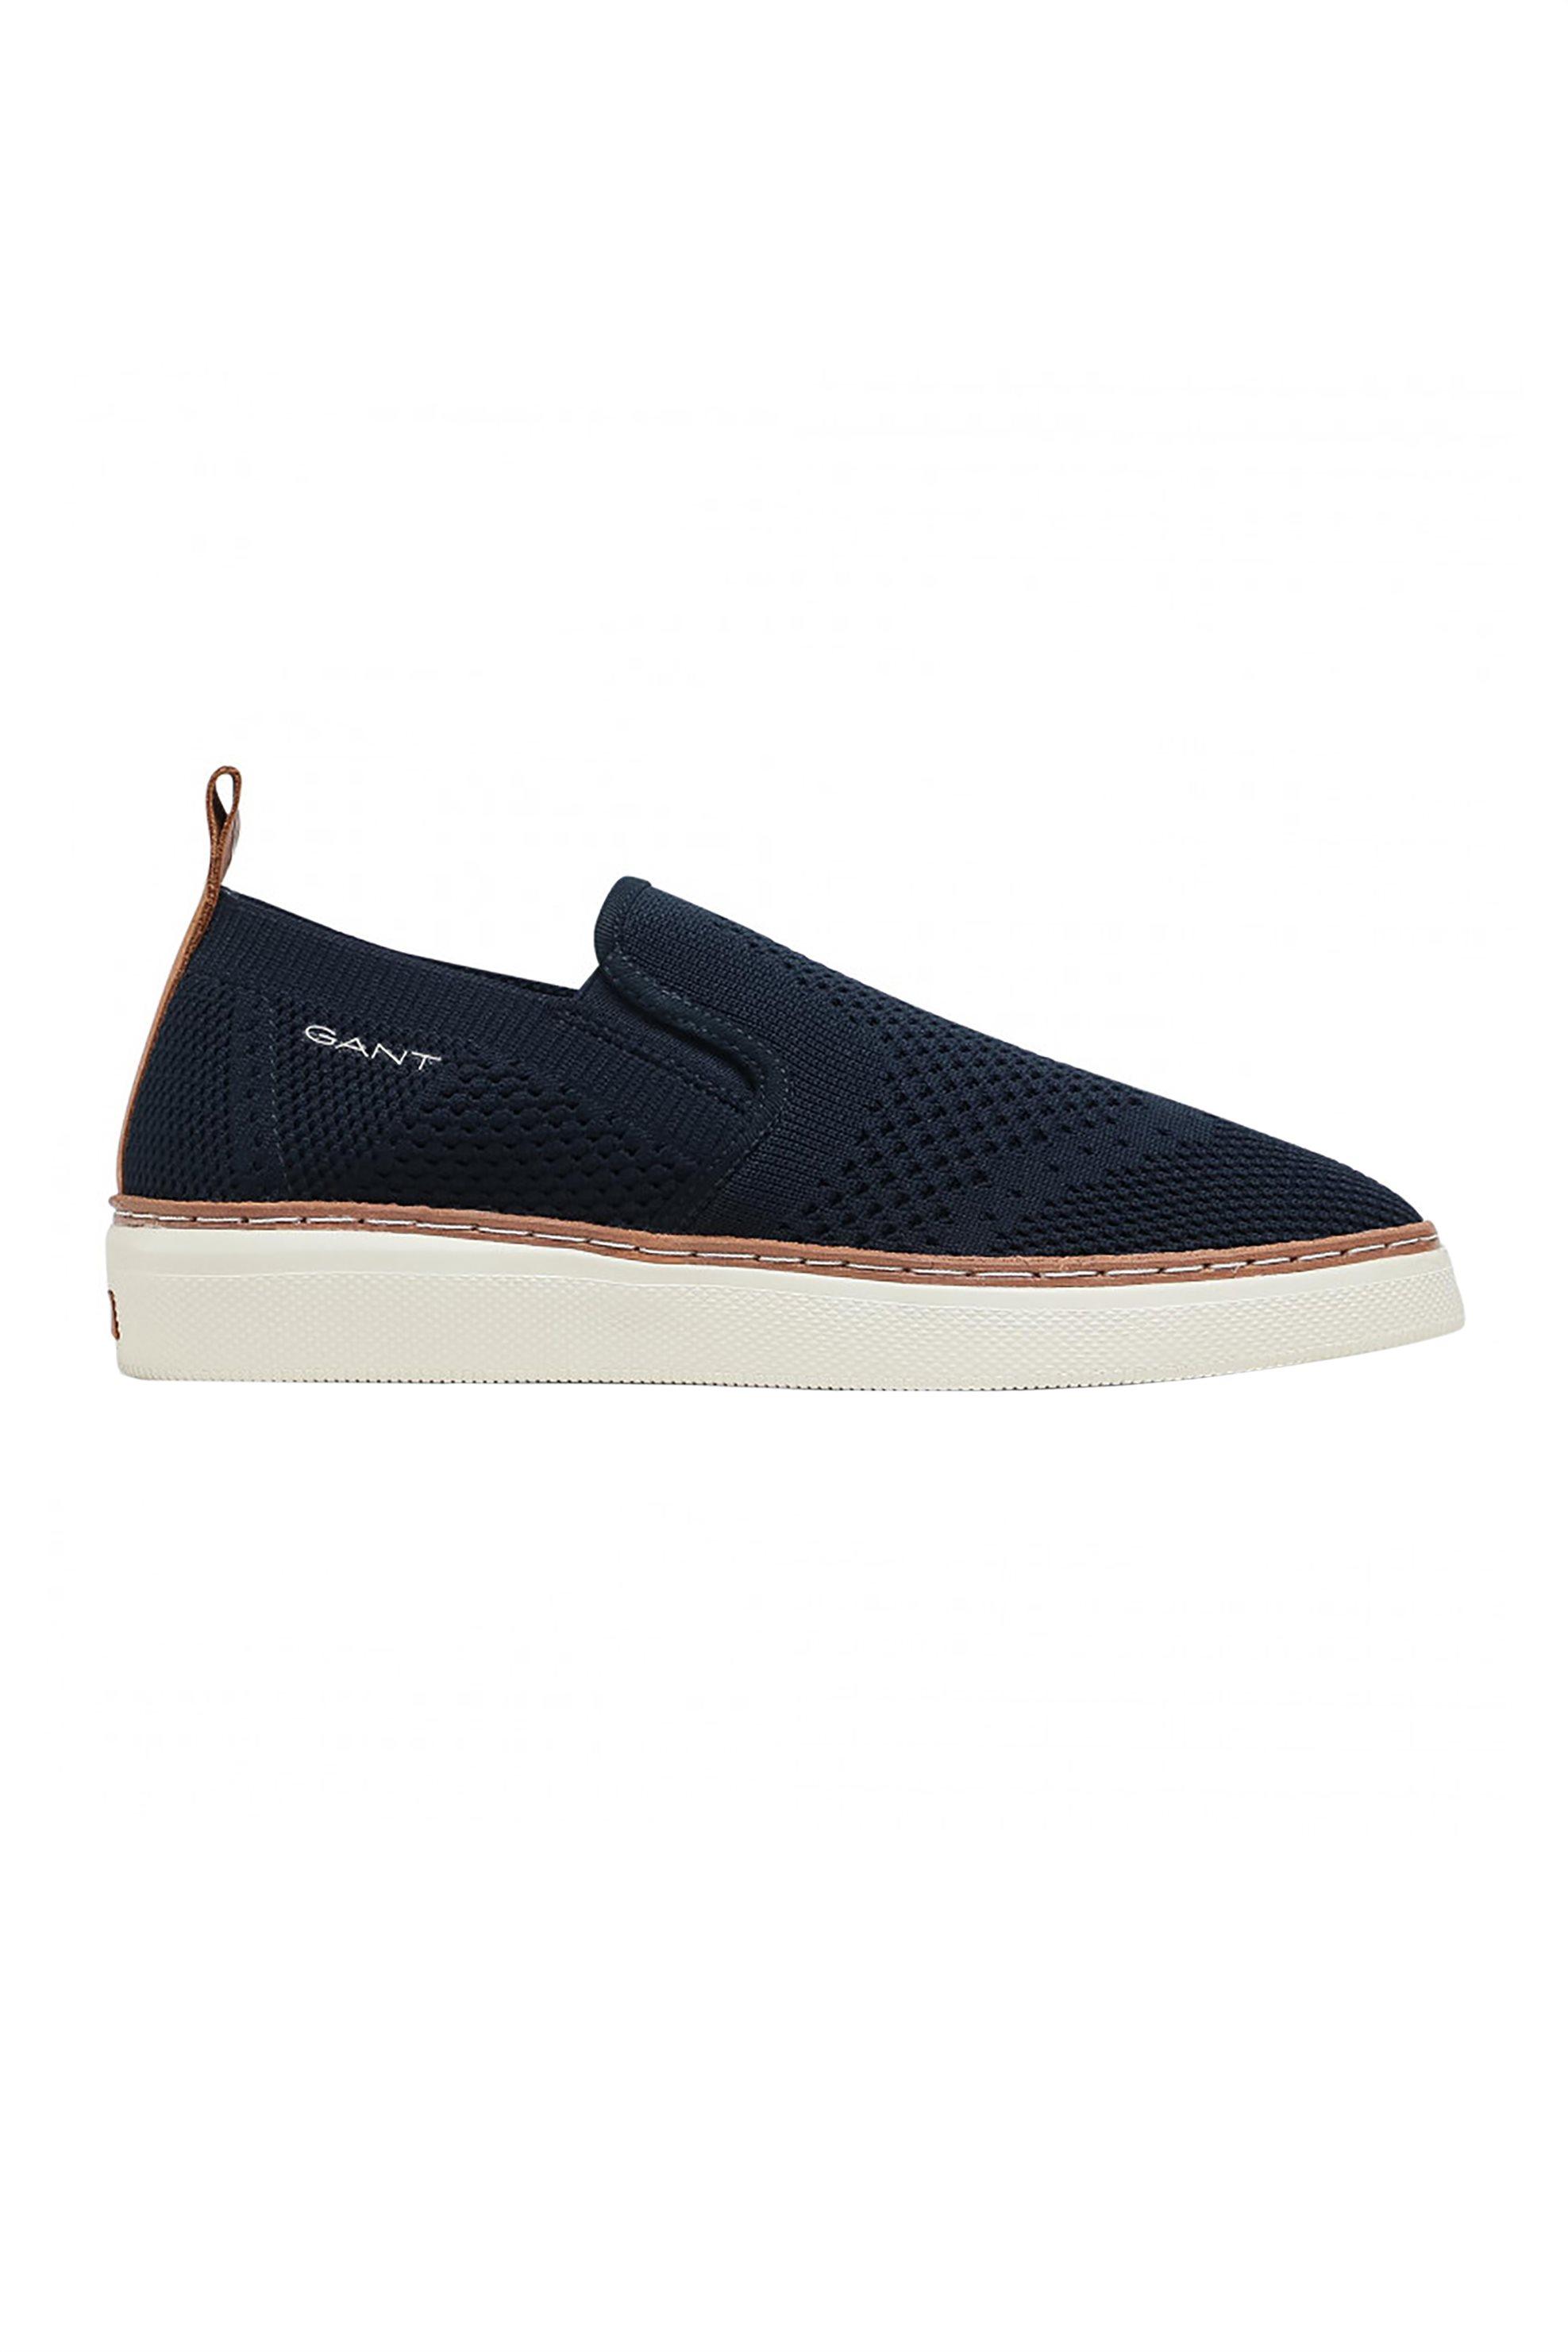 "Gant ανδρικά sneakers slip on ""San Prep"" – 22637676 – Μπλε Σκούρο"